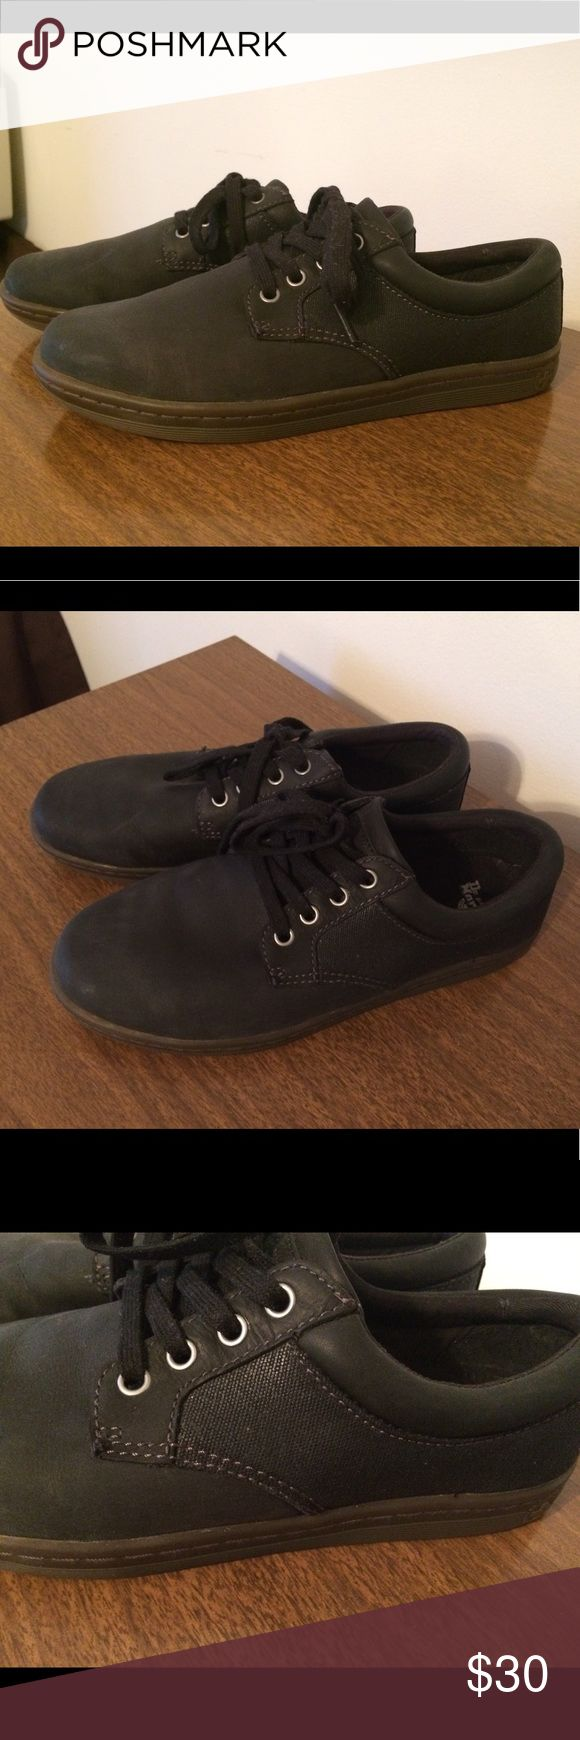 Dr Marten Black Leather Canvas Mason Shoes M 8 W9 Great condition. Mens Size 8, Women's Size 9, UK 7, EU 41. Hard to find! Dr. Martens Shoes